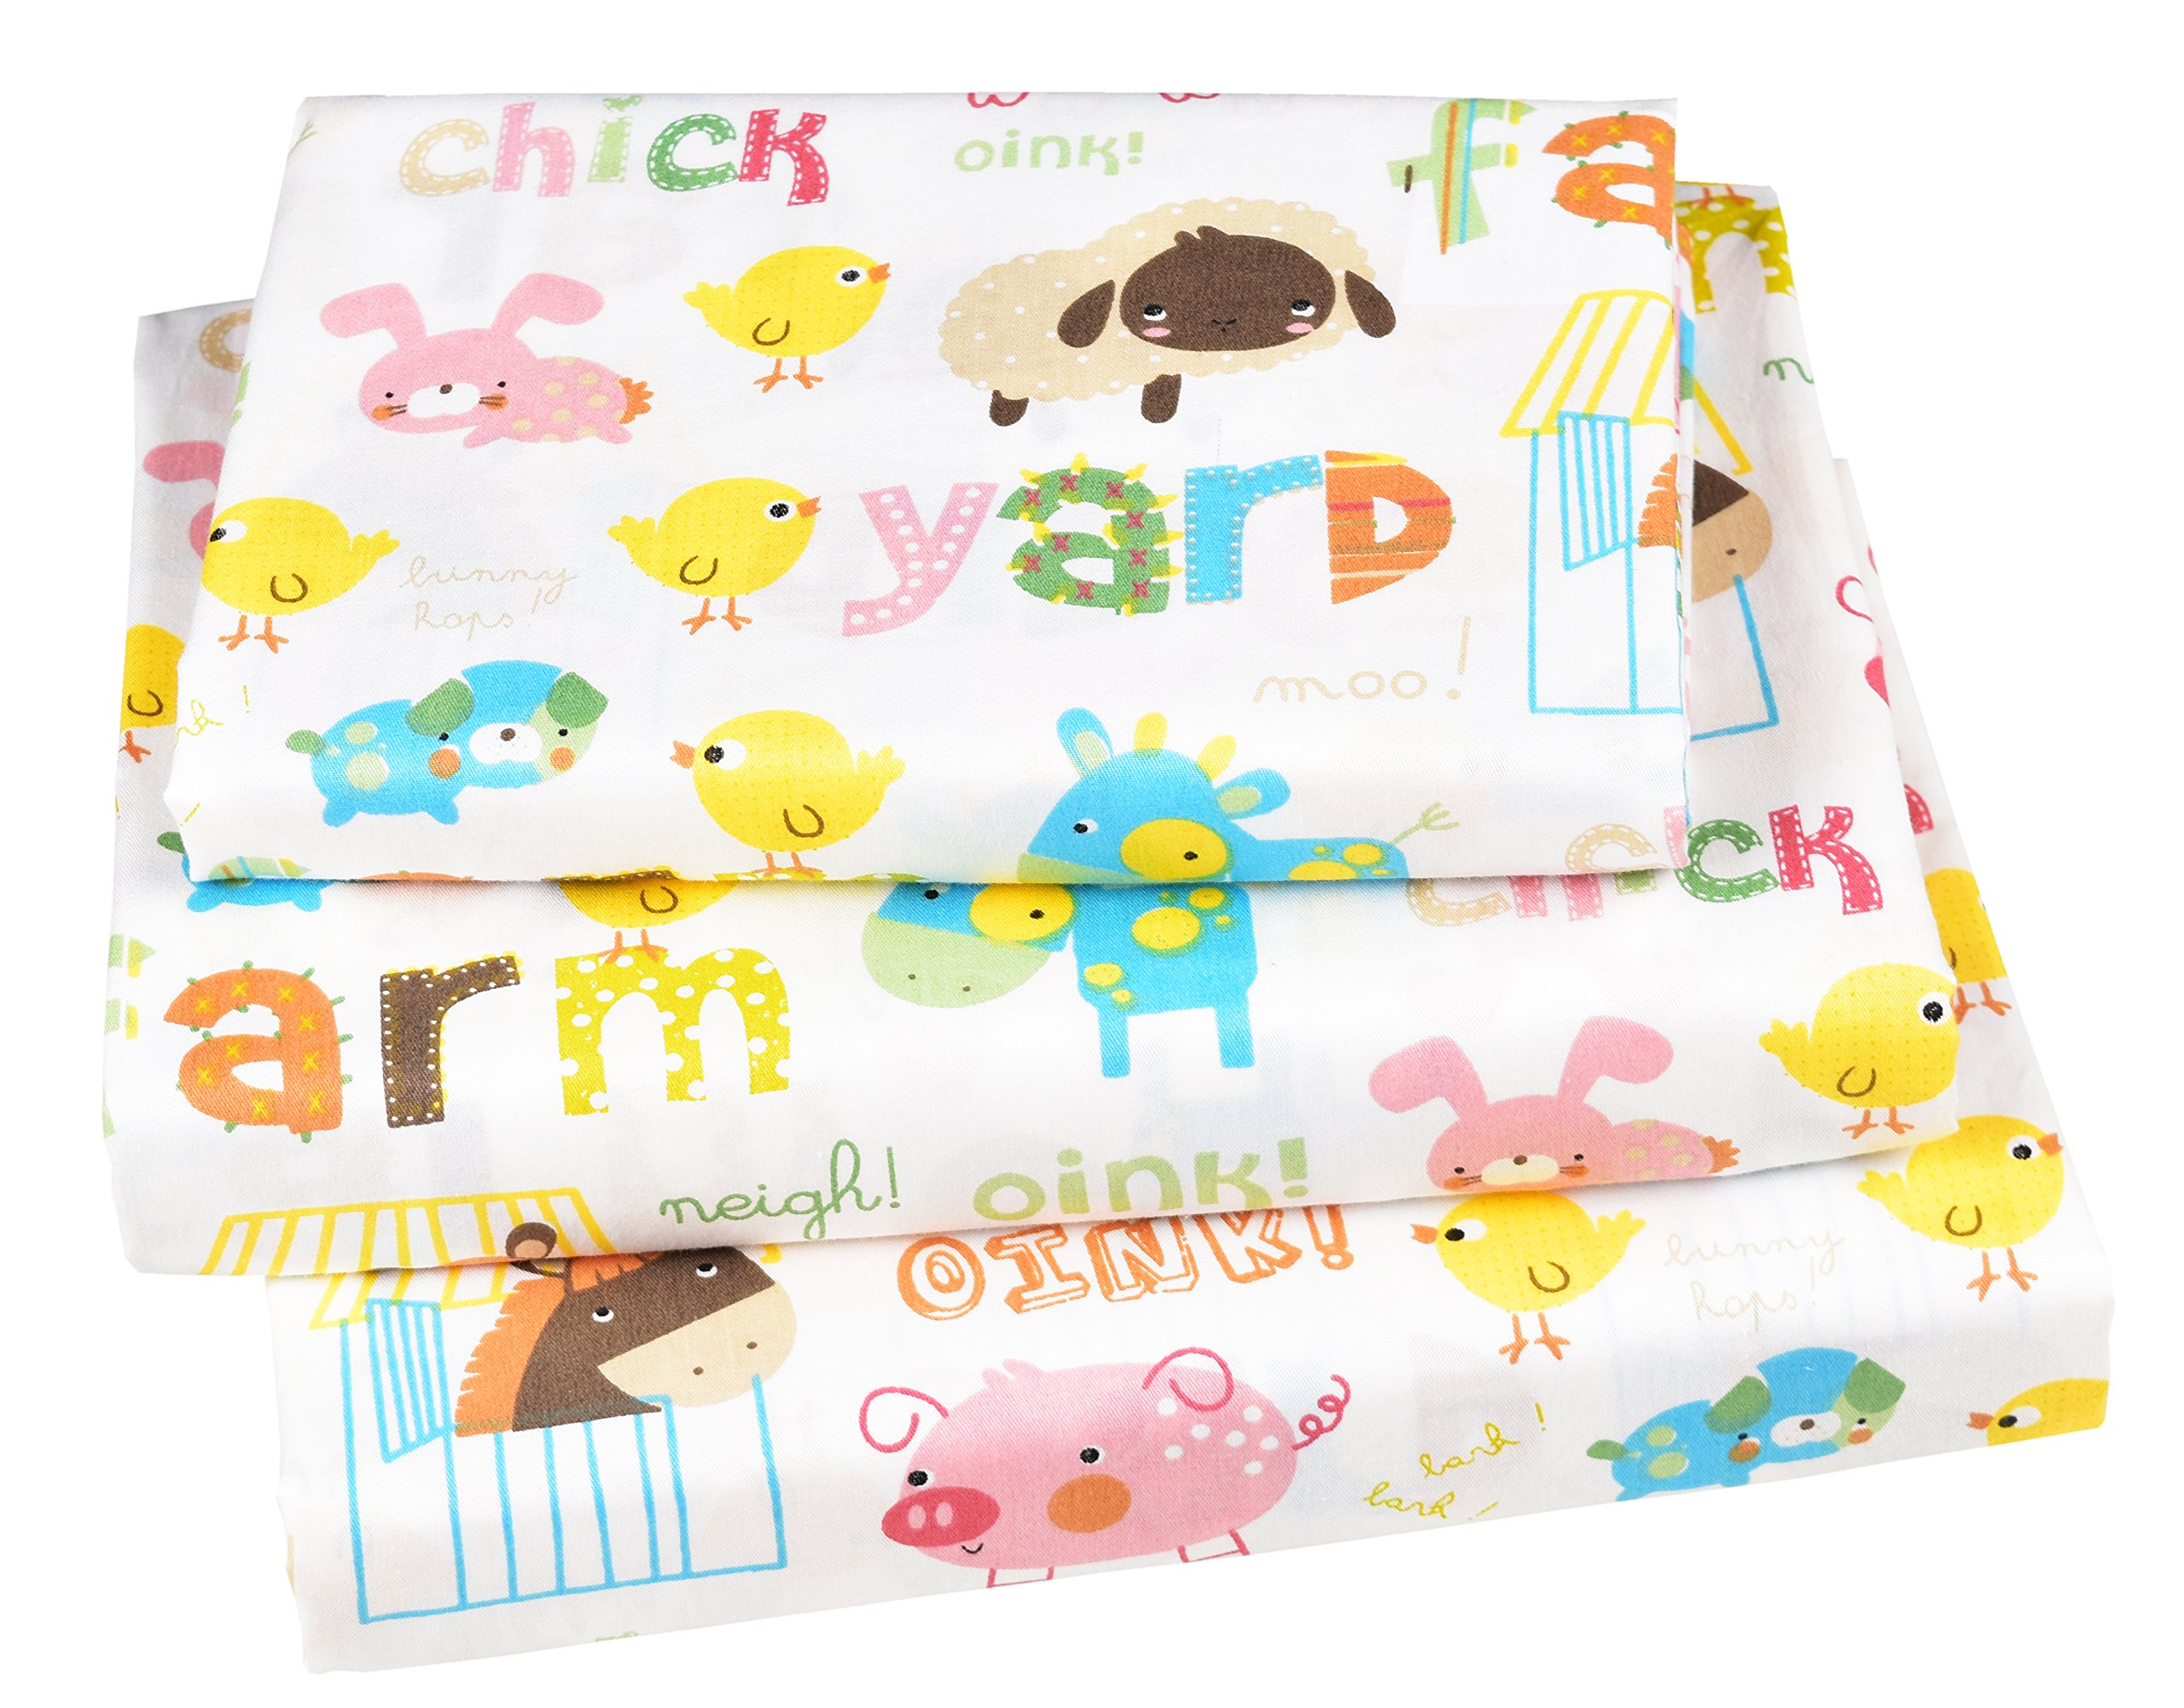 J-pinno Farm Animals Pig Horse Chick Sheep Donkey Twin Sheet Set for Kids Boys Girls Children,100% Cotton, Flat Sheet + Fitted Sheet + Pillowcase Bedding Set